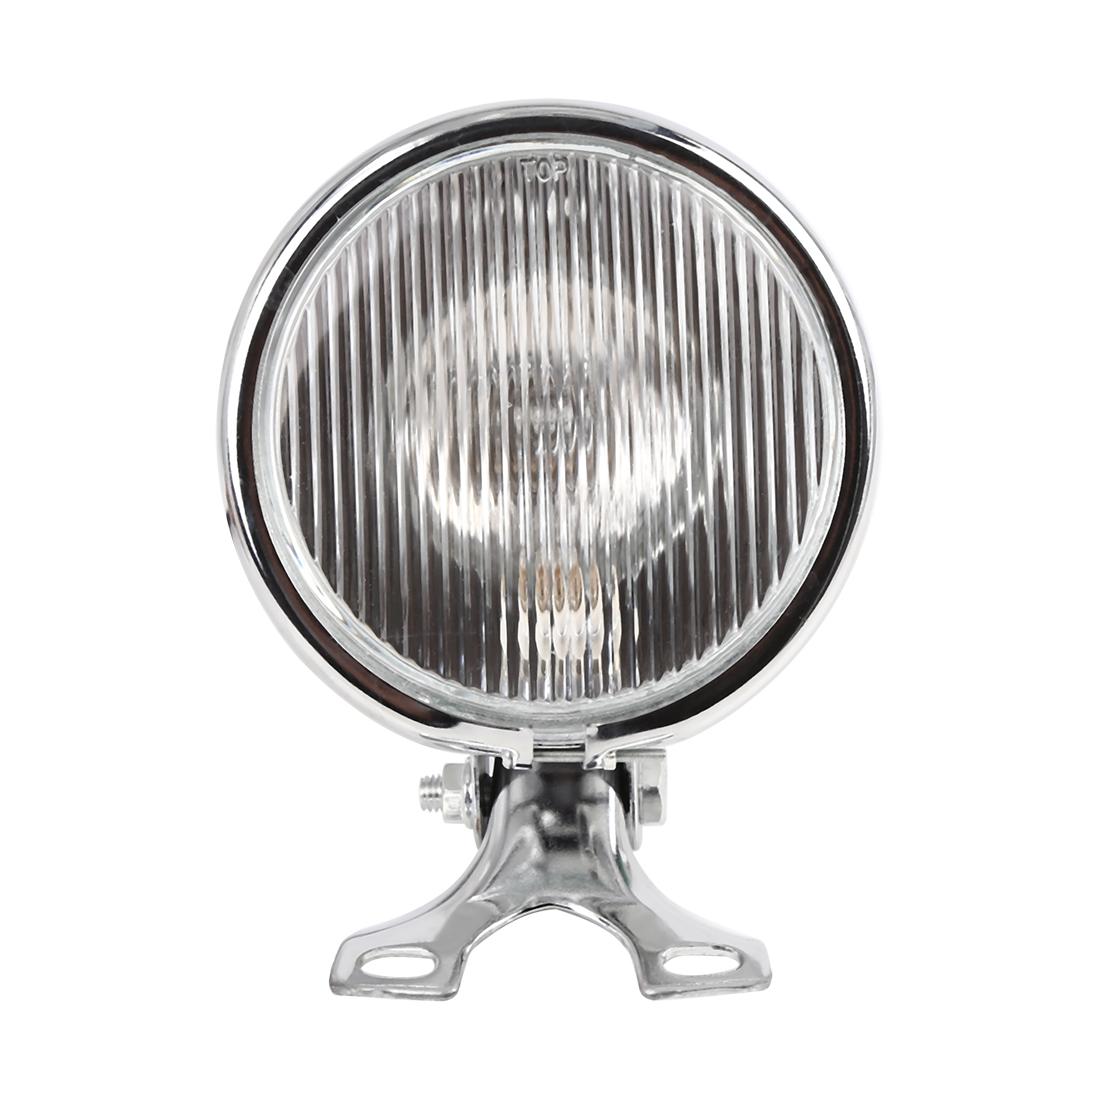 Silver Tone 35W Yellow Light Round Motorcycle Halogen Headlight High Low Beam